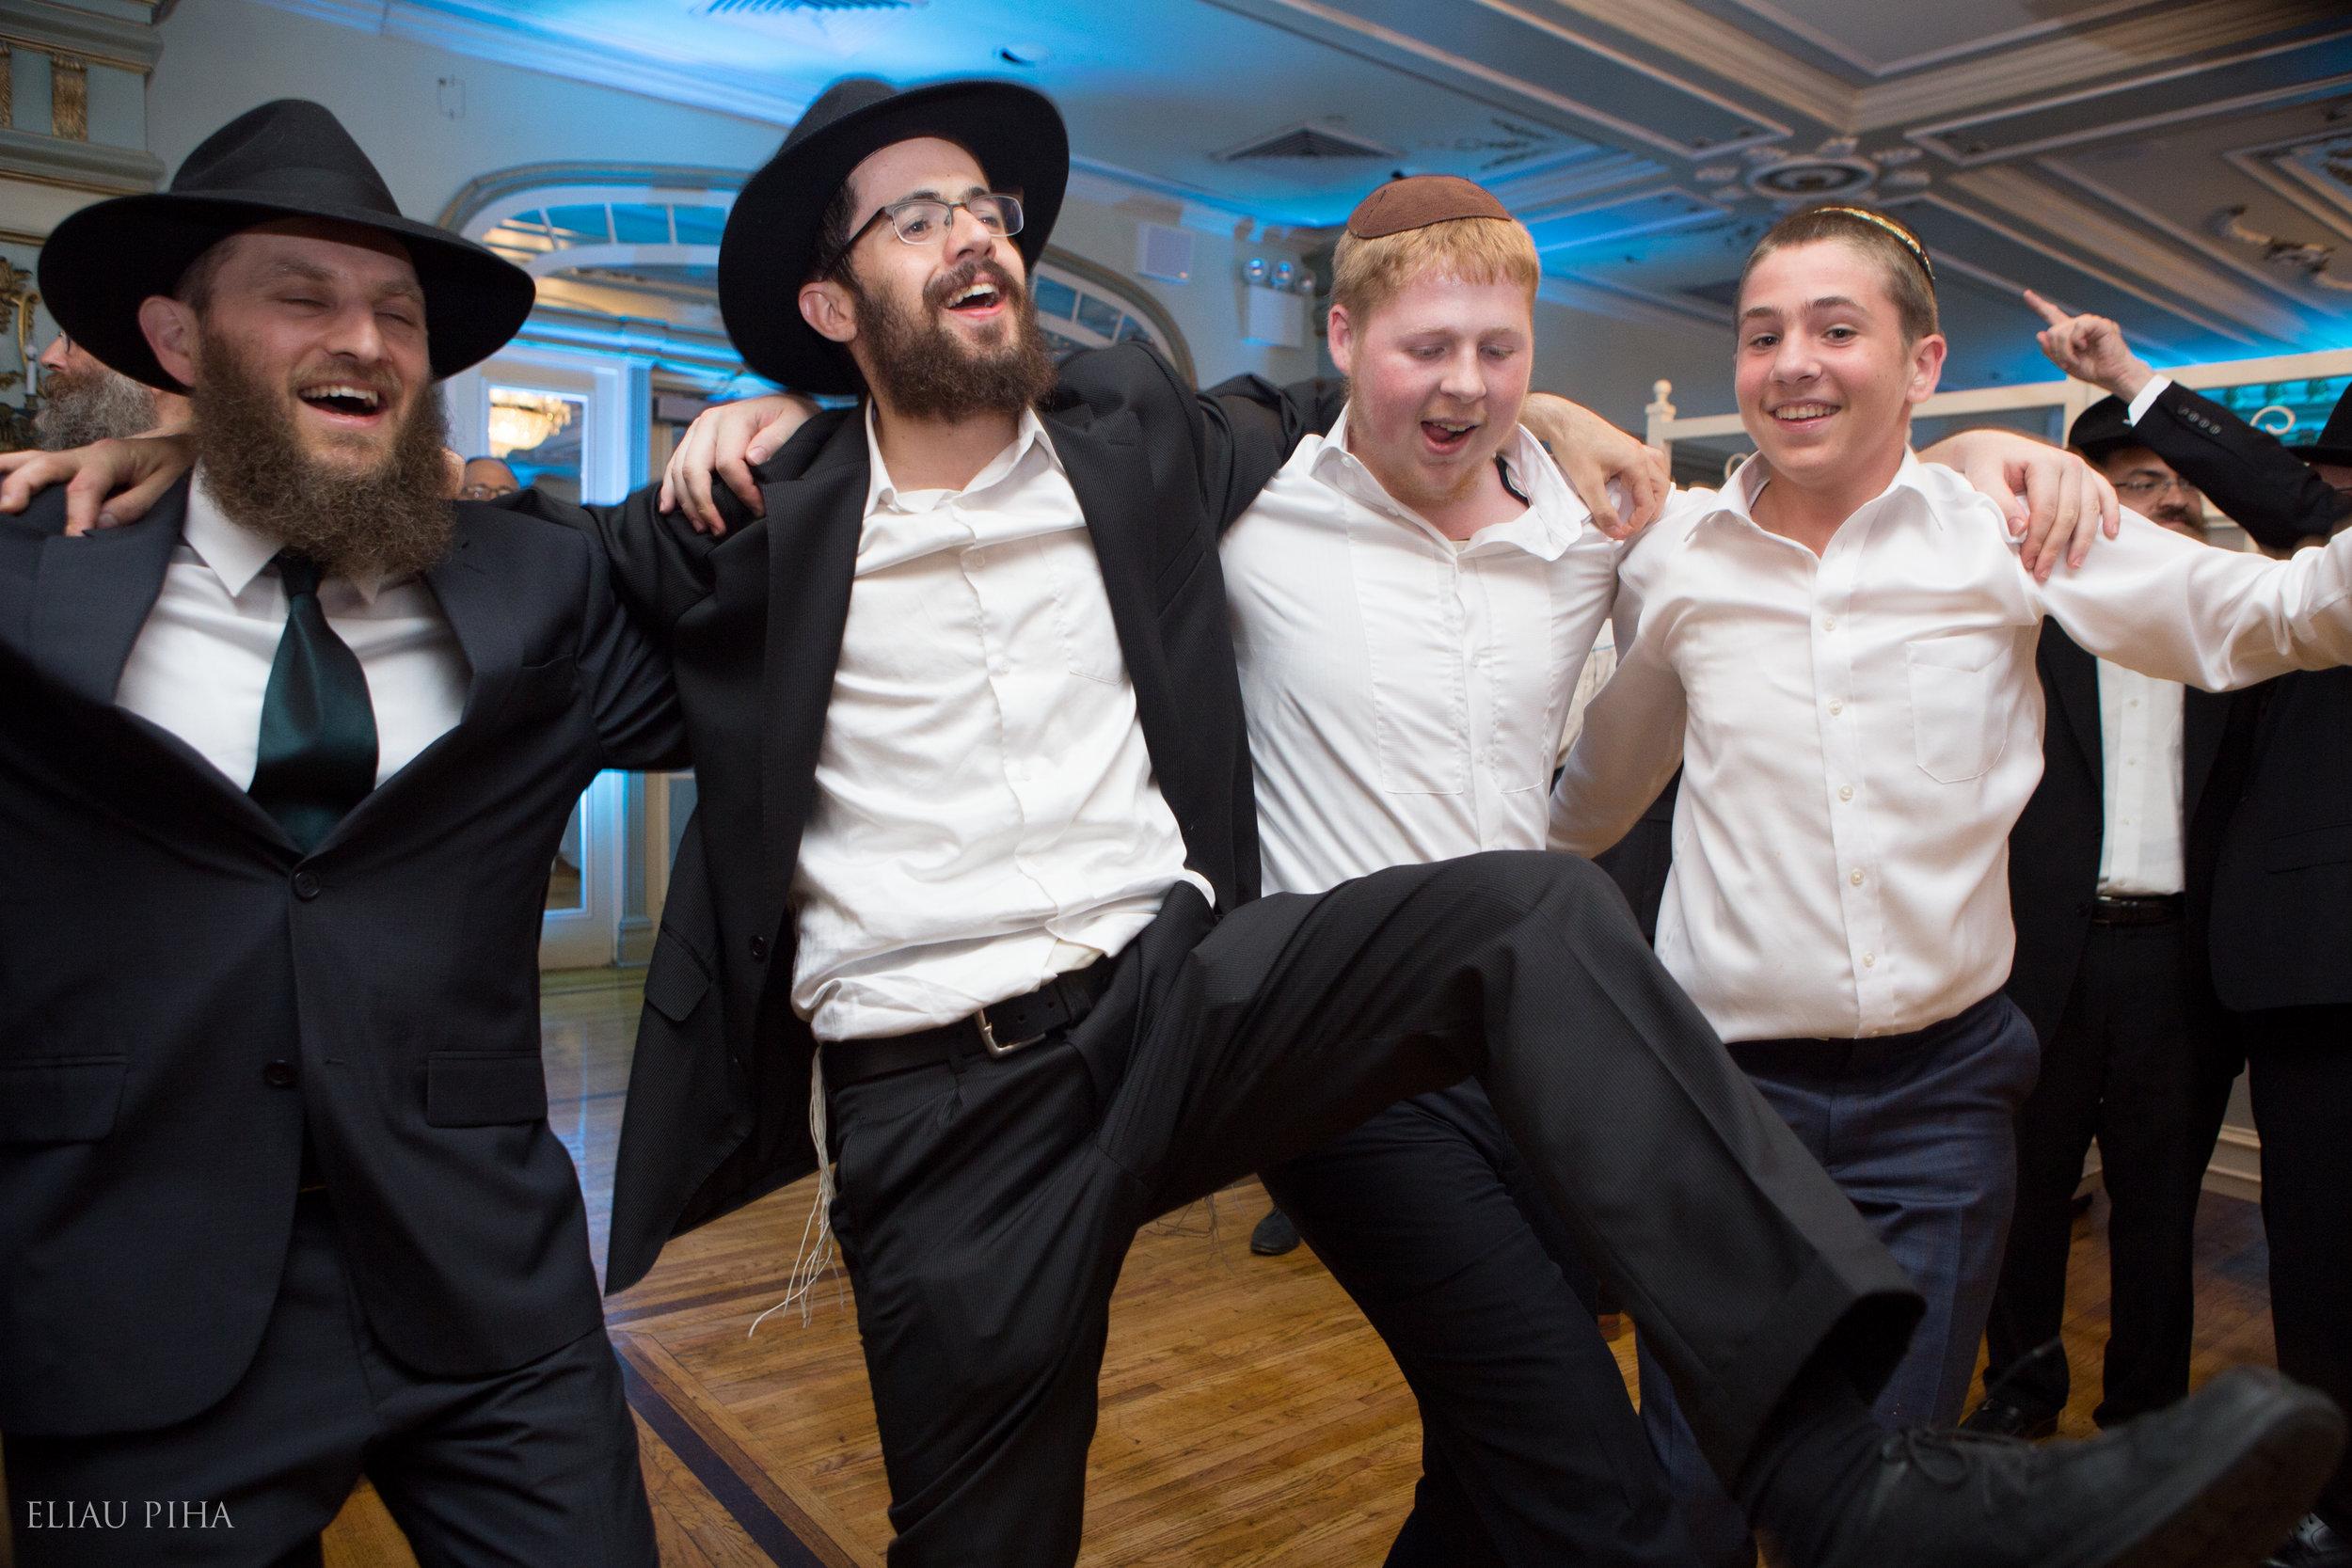 Bar Mitzvah Meir Sandman - photography, new york, events, people -0370.jpg